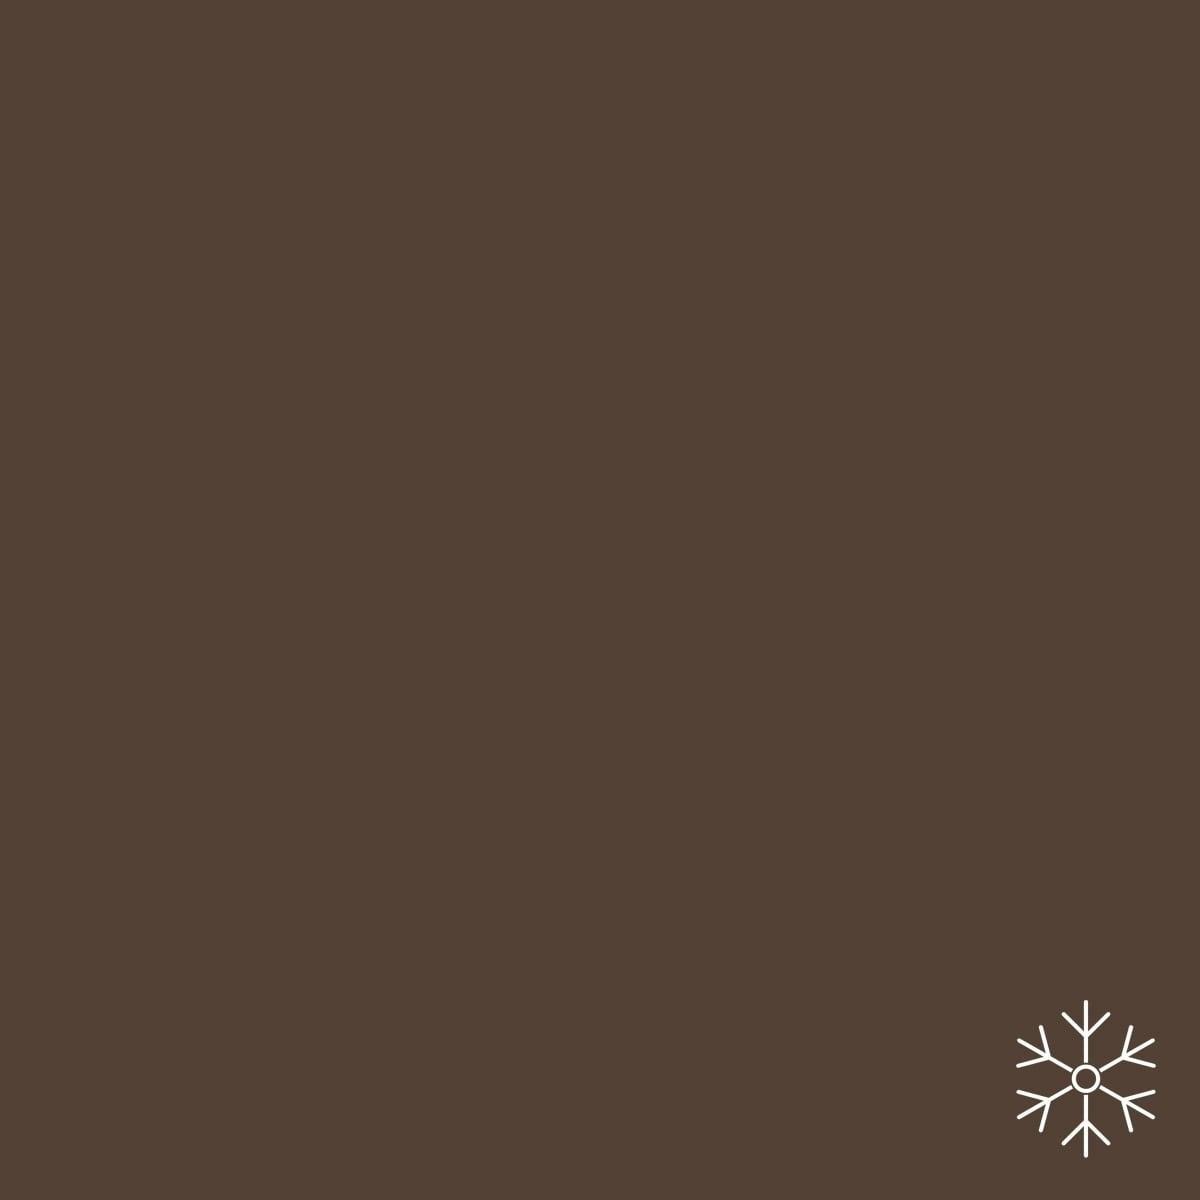 Organicline (5 ml)  - PIGMENTS AMIEA ORGANICLINE DARK CHOCOLATE, Flacon 5 ml